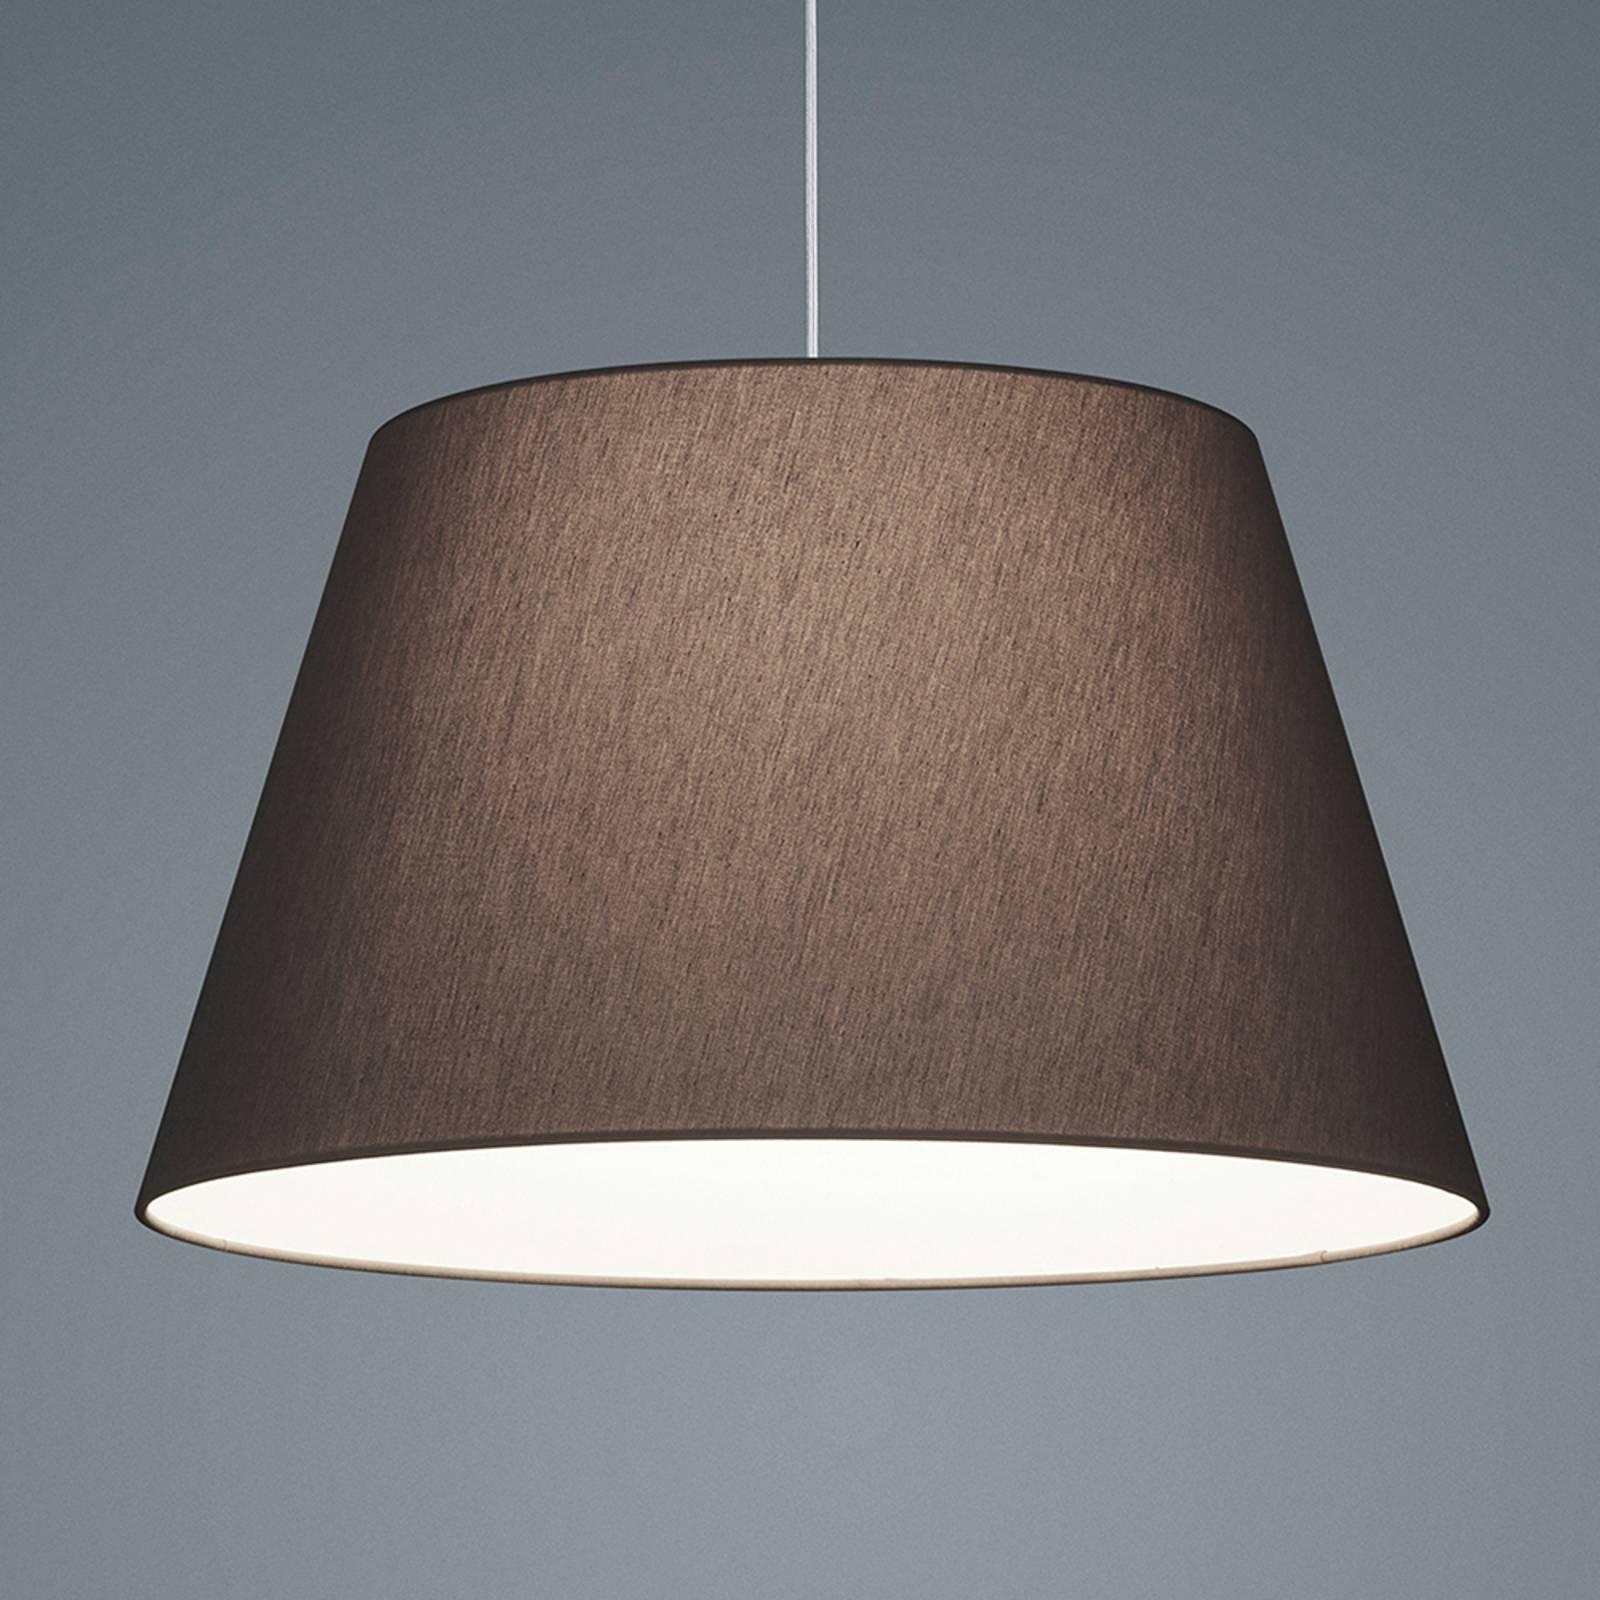 Helestra Certo -valo kartio 1-lamp. antrasiitti